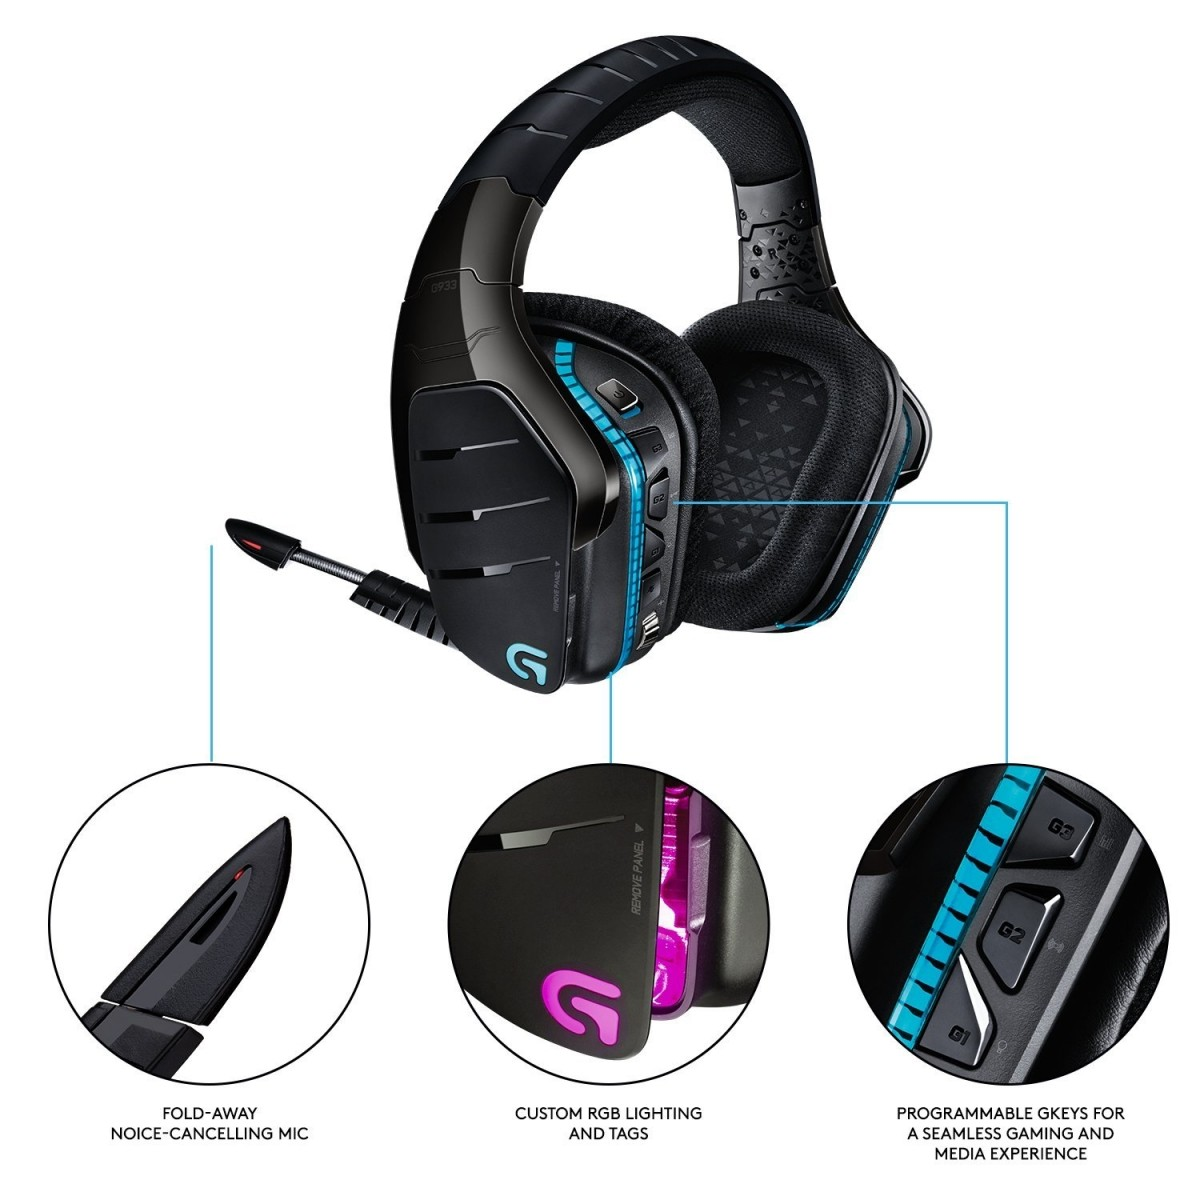 Headset Gamer Logitech Wireless 7 1 Surround G933 Artemis Spectrum P/  PC,PS4,XBOX ONE